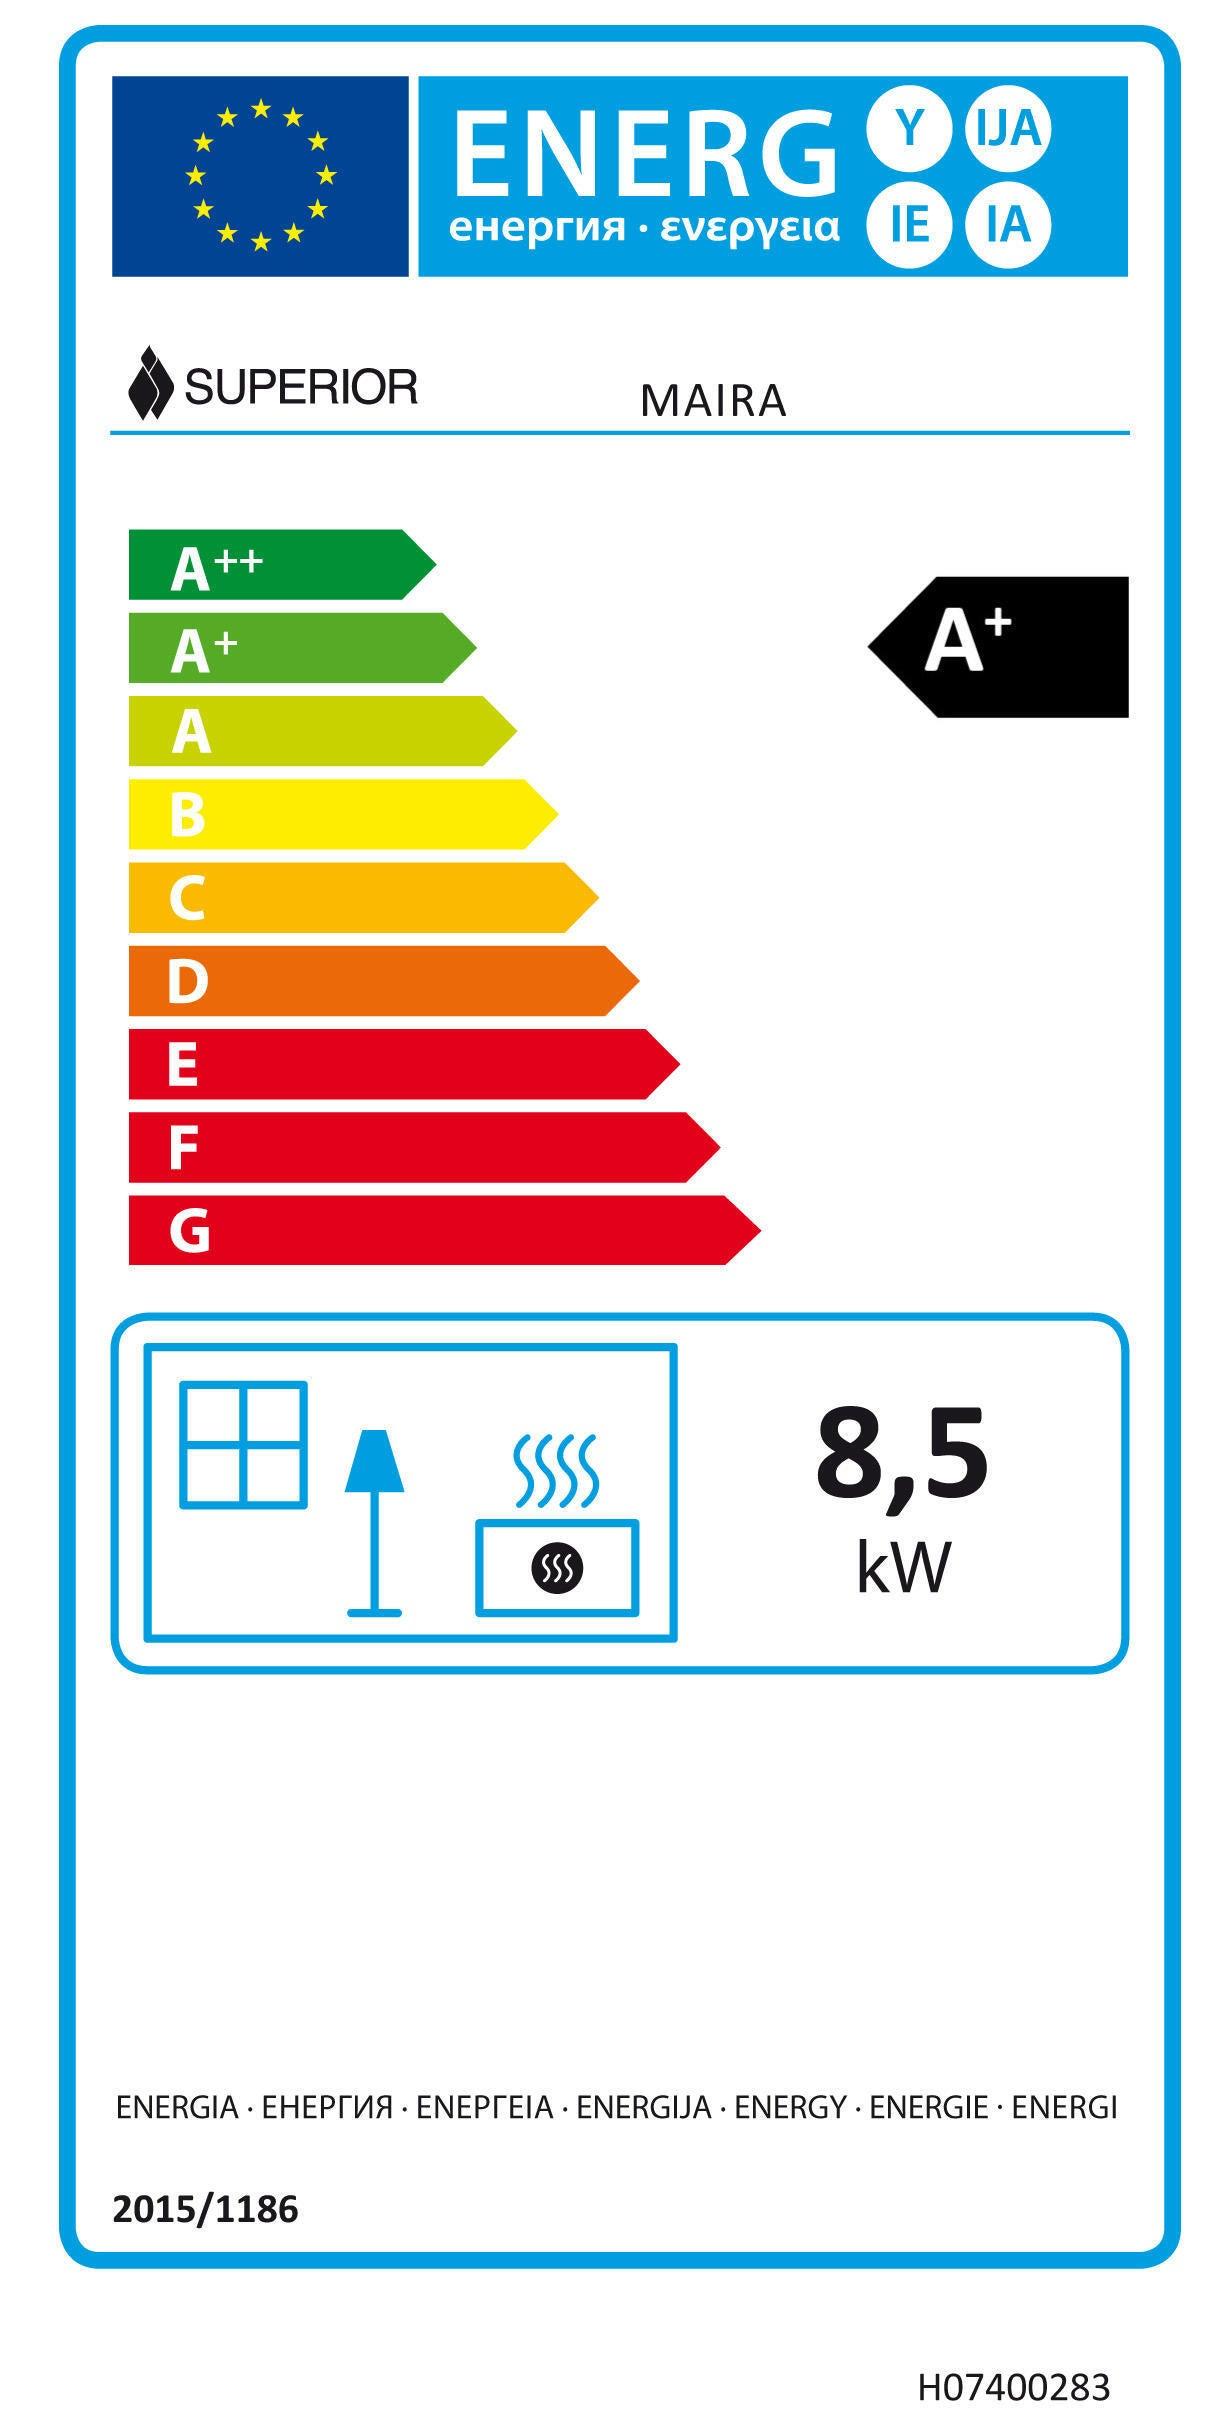 Stufa a pellet ventilata Maira 8.5 kW sale e pepe - 3